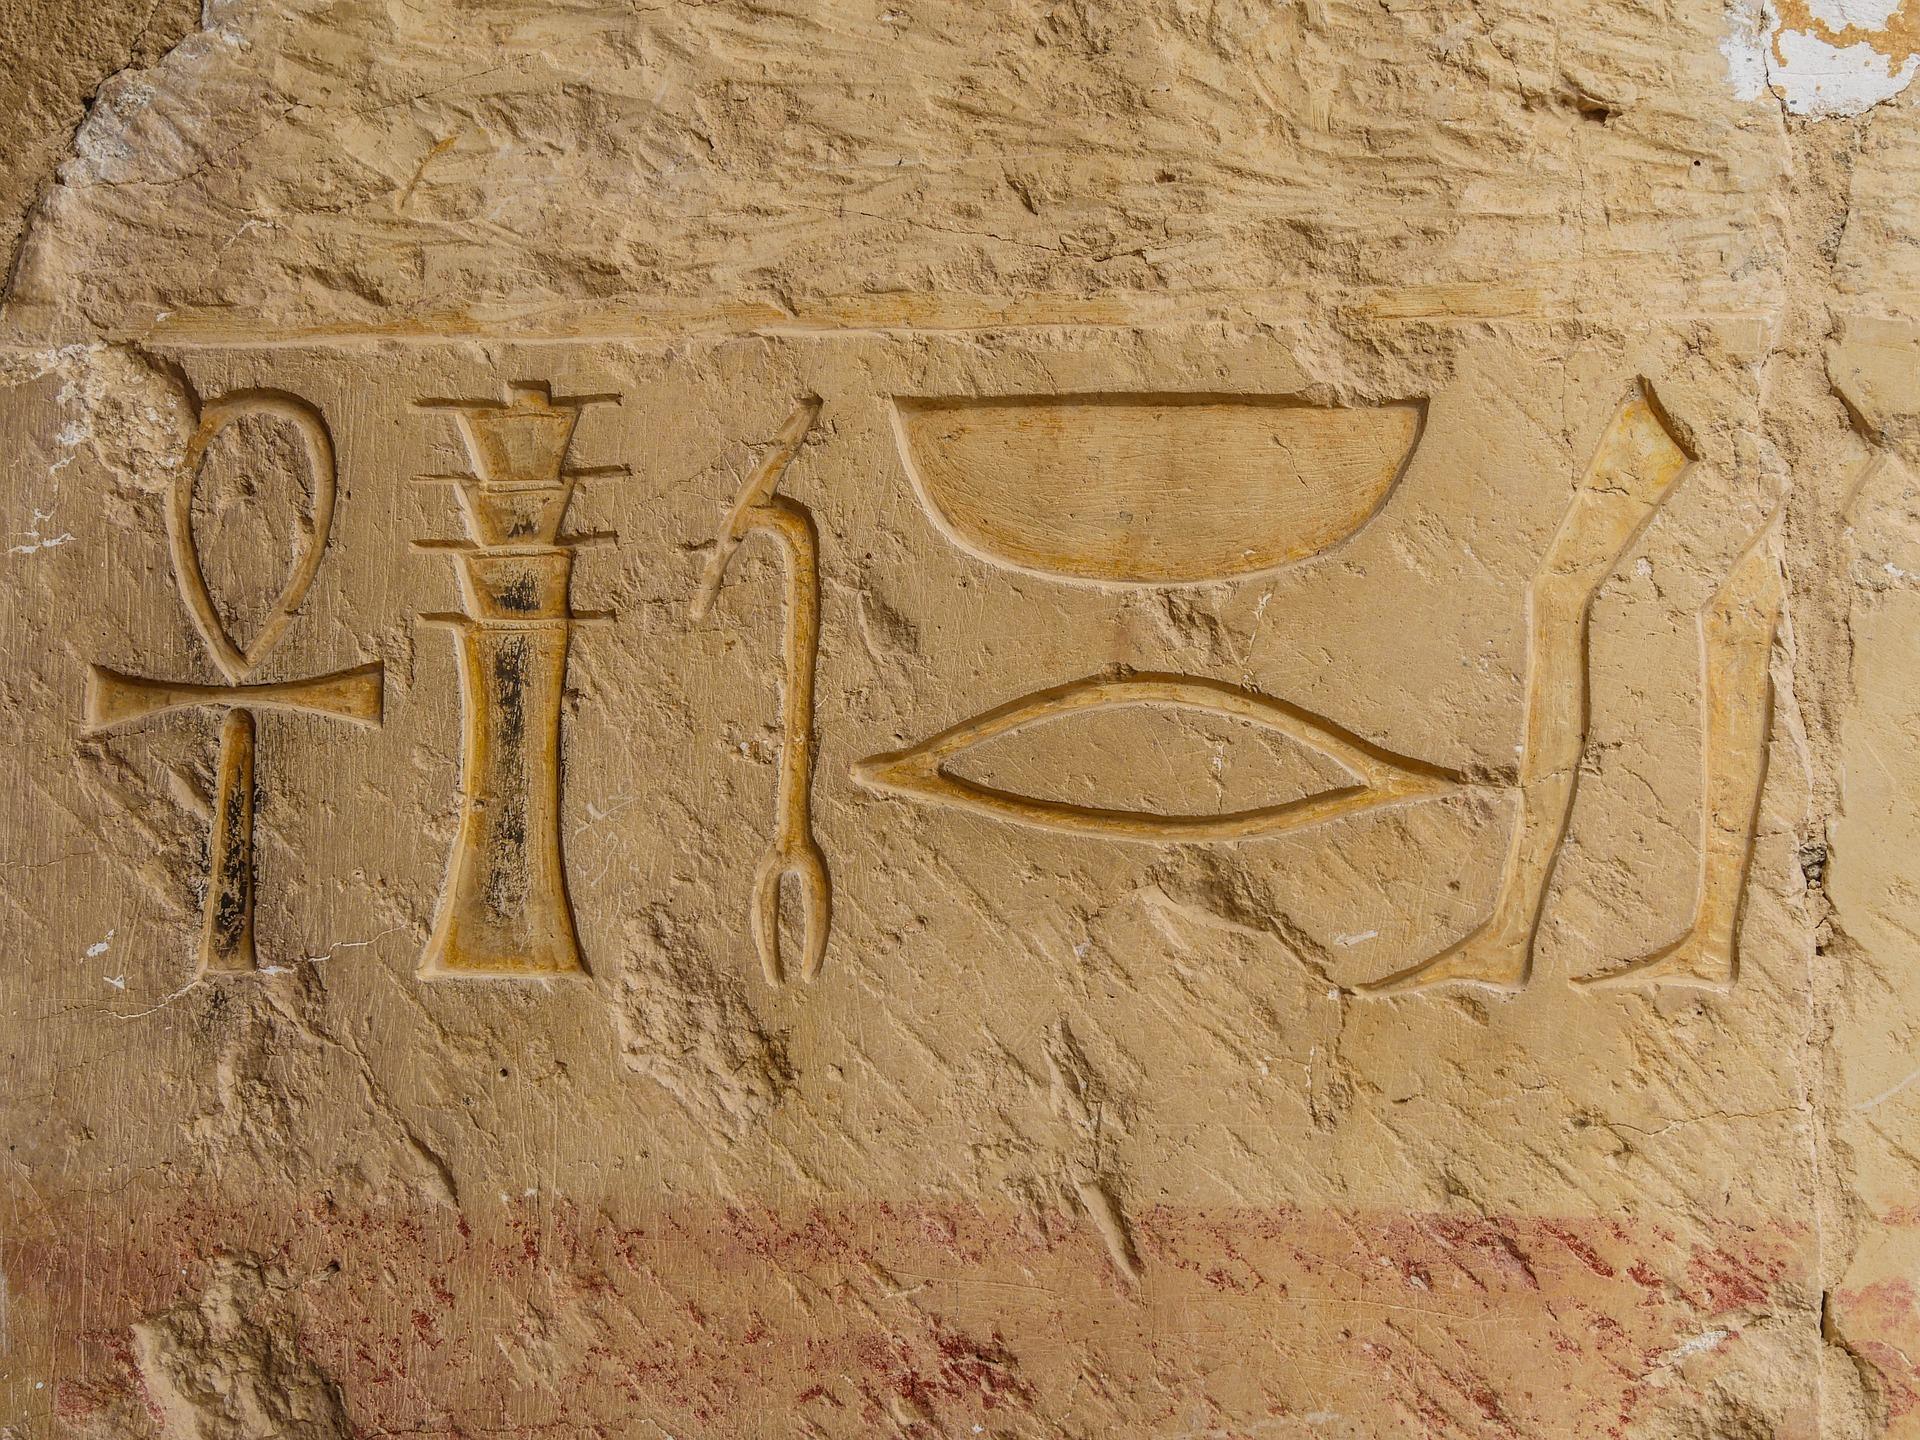 hieroglyphics-3274645_1920.jpg